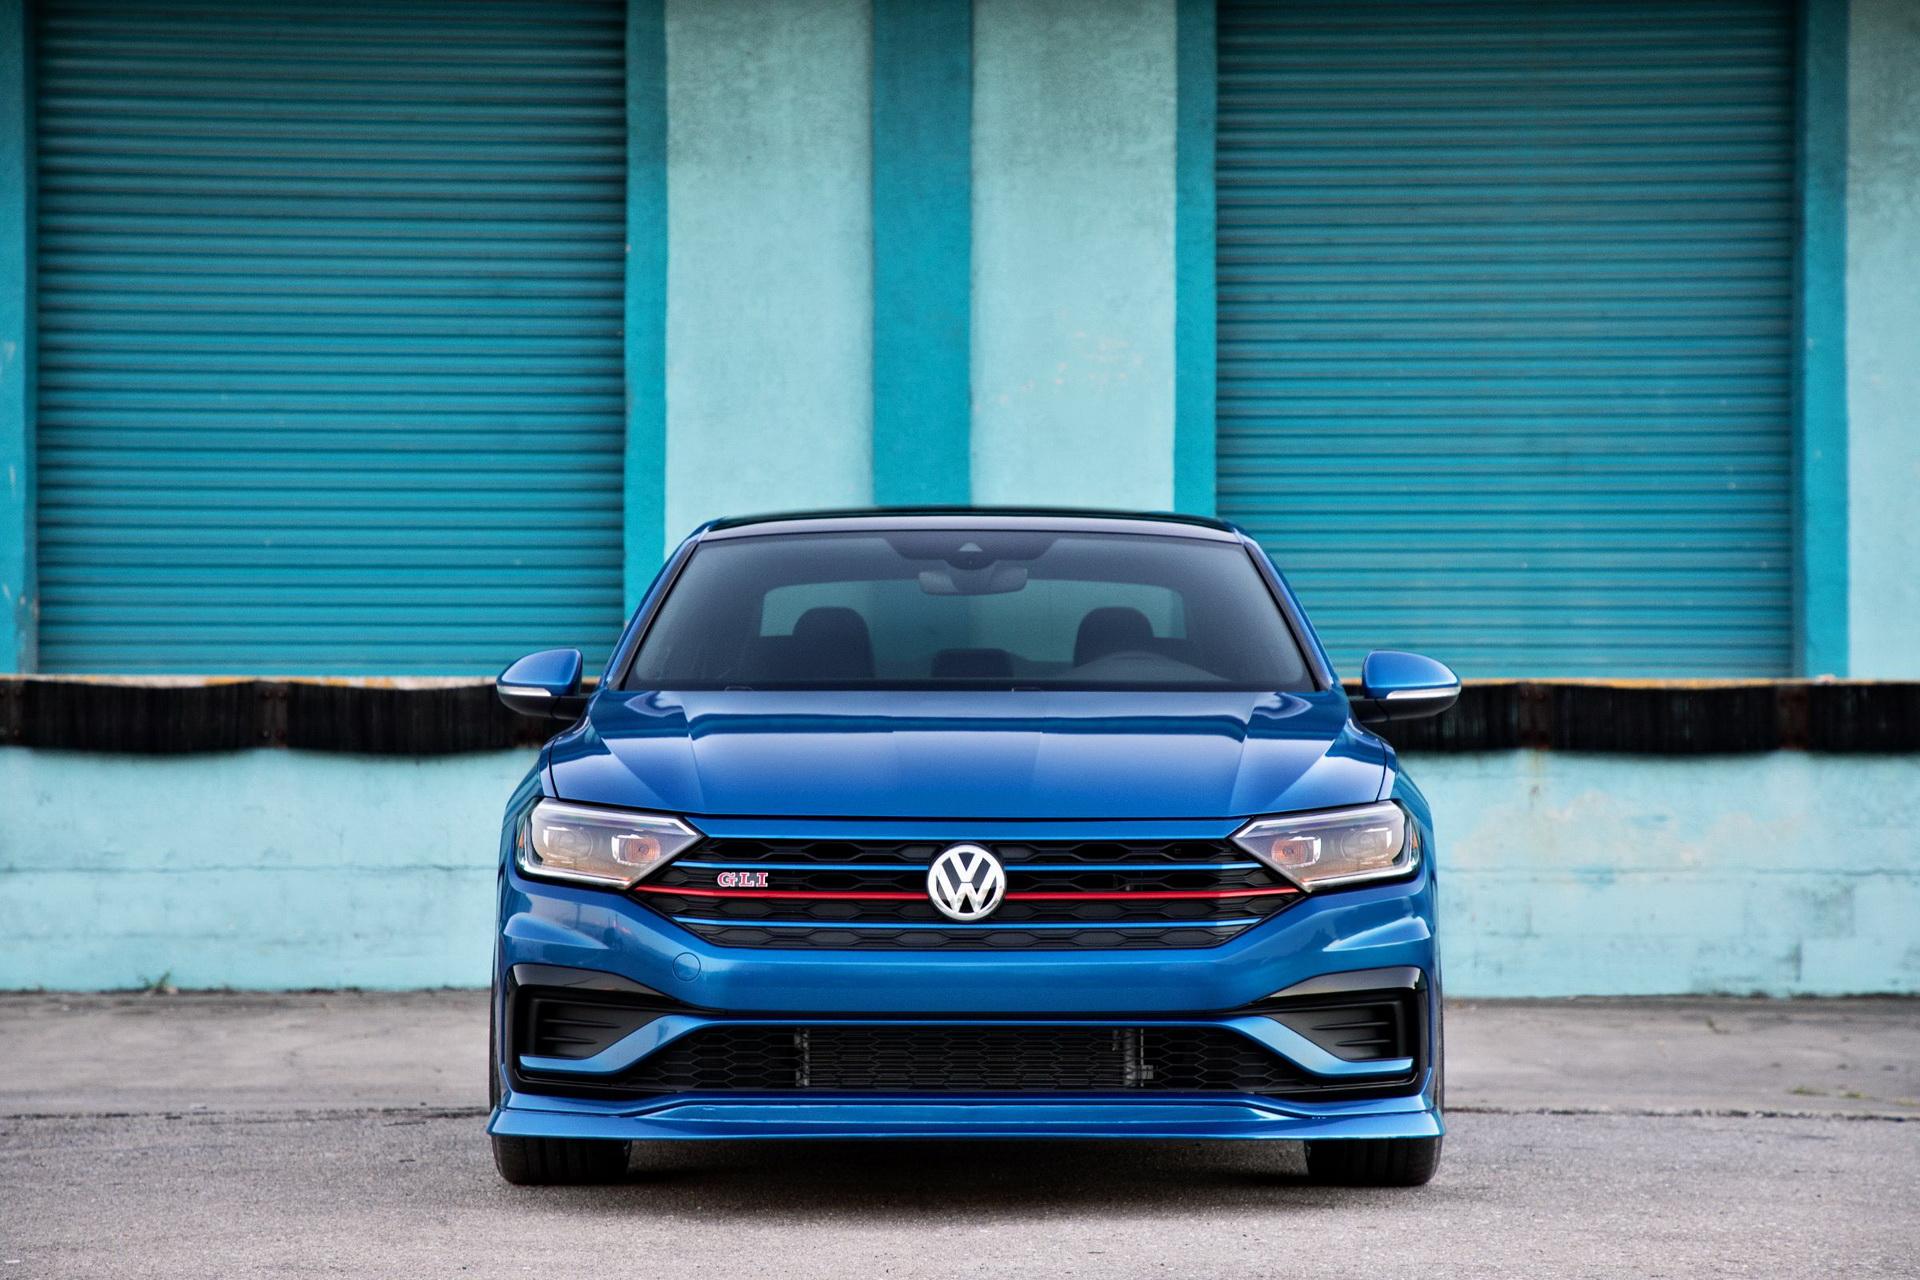 Volkswagen готовит спецсерию популярных моделей – Jetta уже готова 1